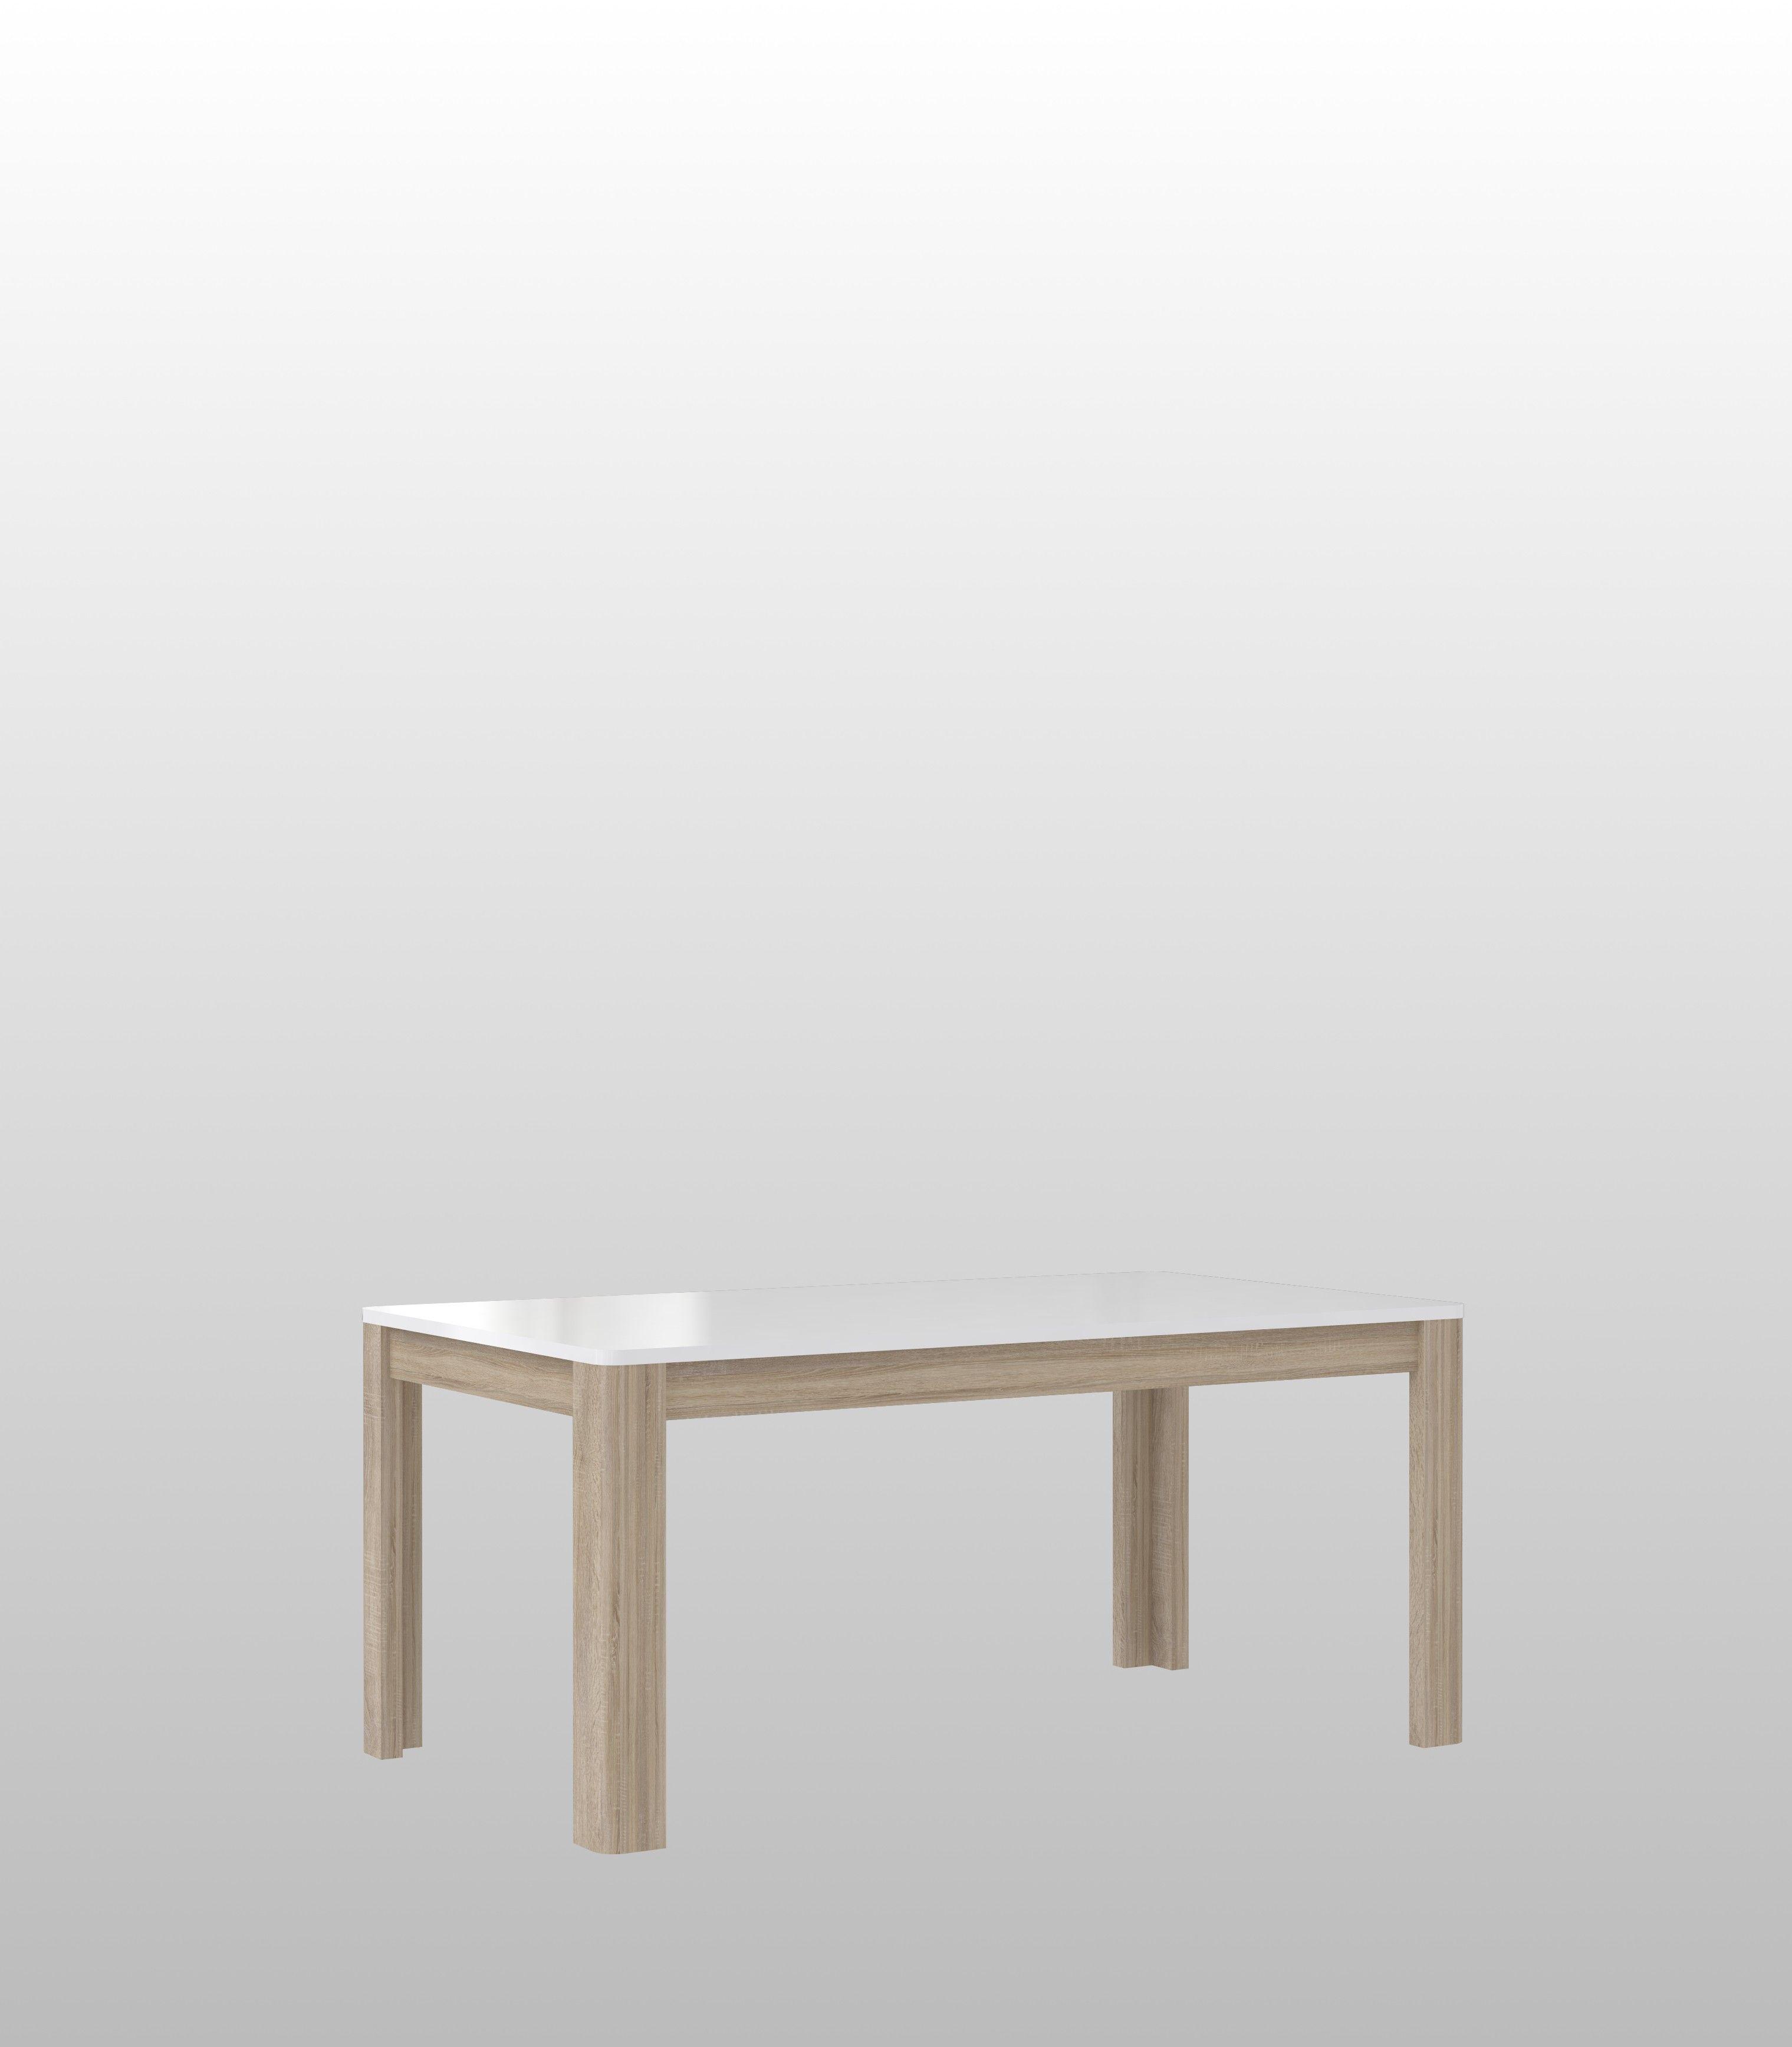 a90d38e6042cc414710dd0b095ef4373 Impressionnant De Table Conforama Cuisine Concept